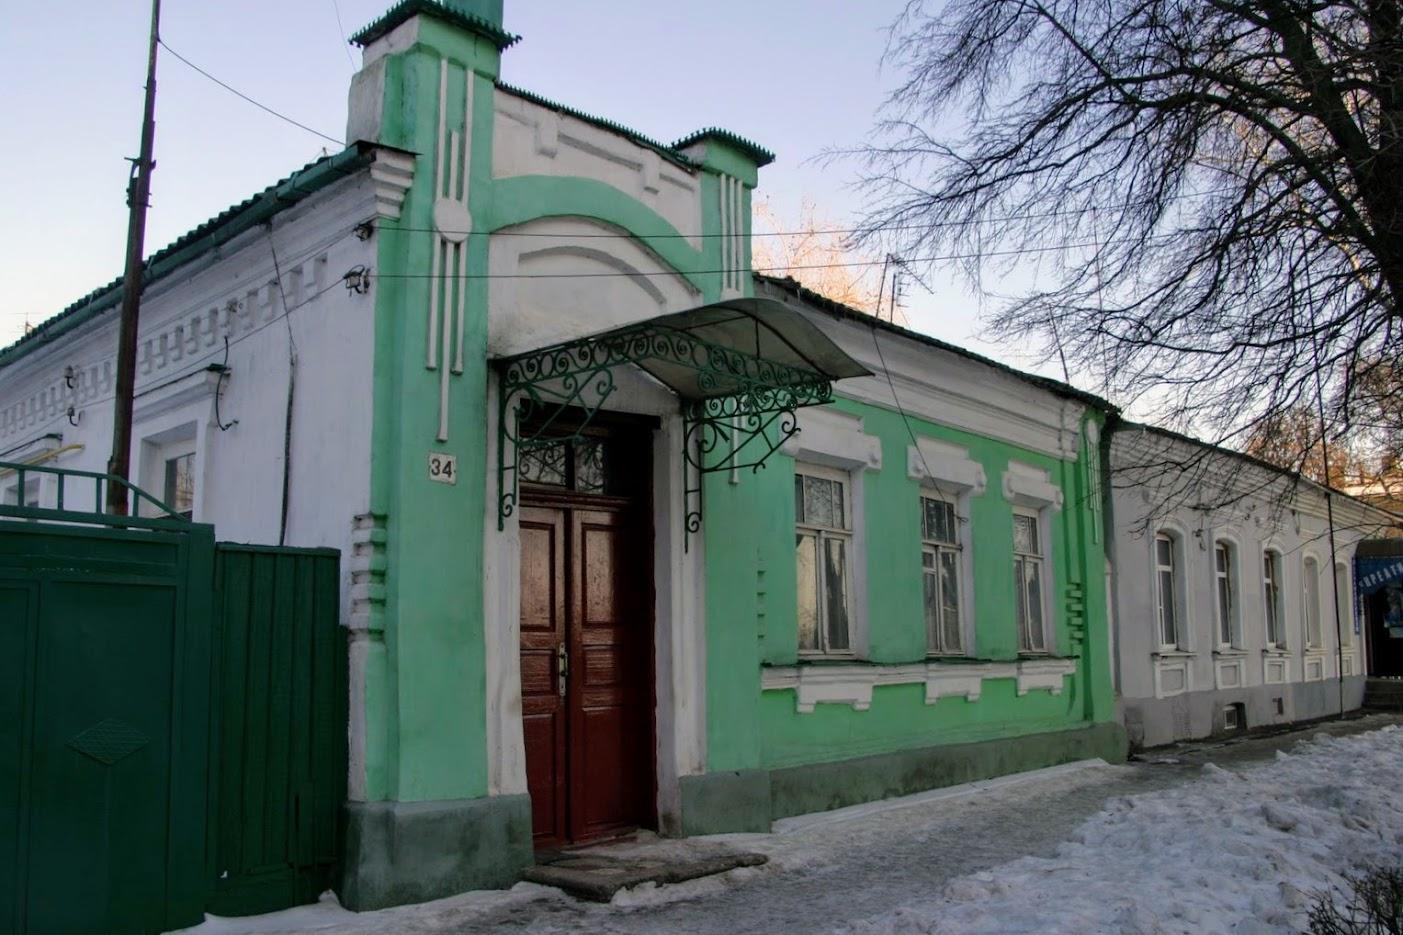 https://sites.google.com/site/istoriceskijtaganrog/cehova-ulica/dom-34